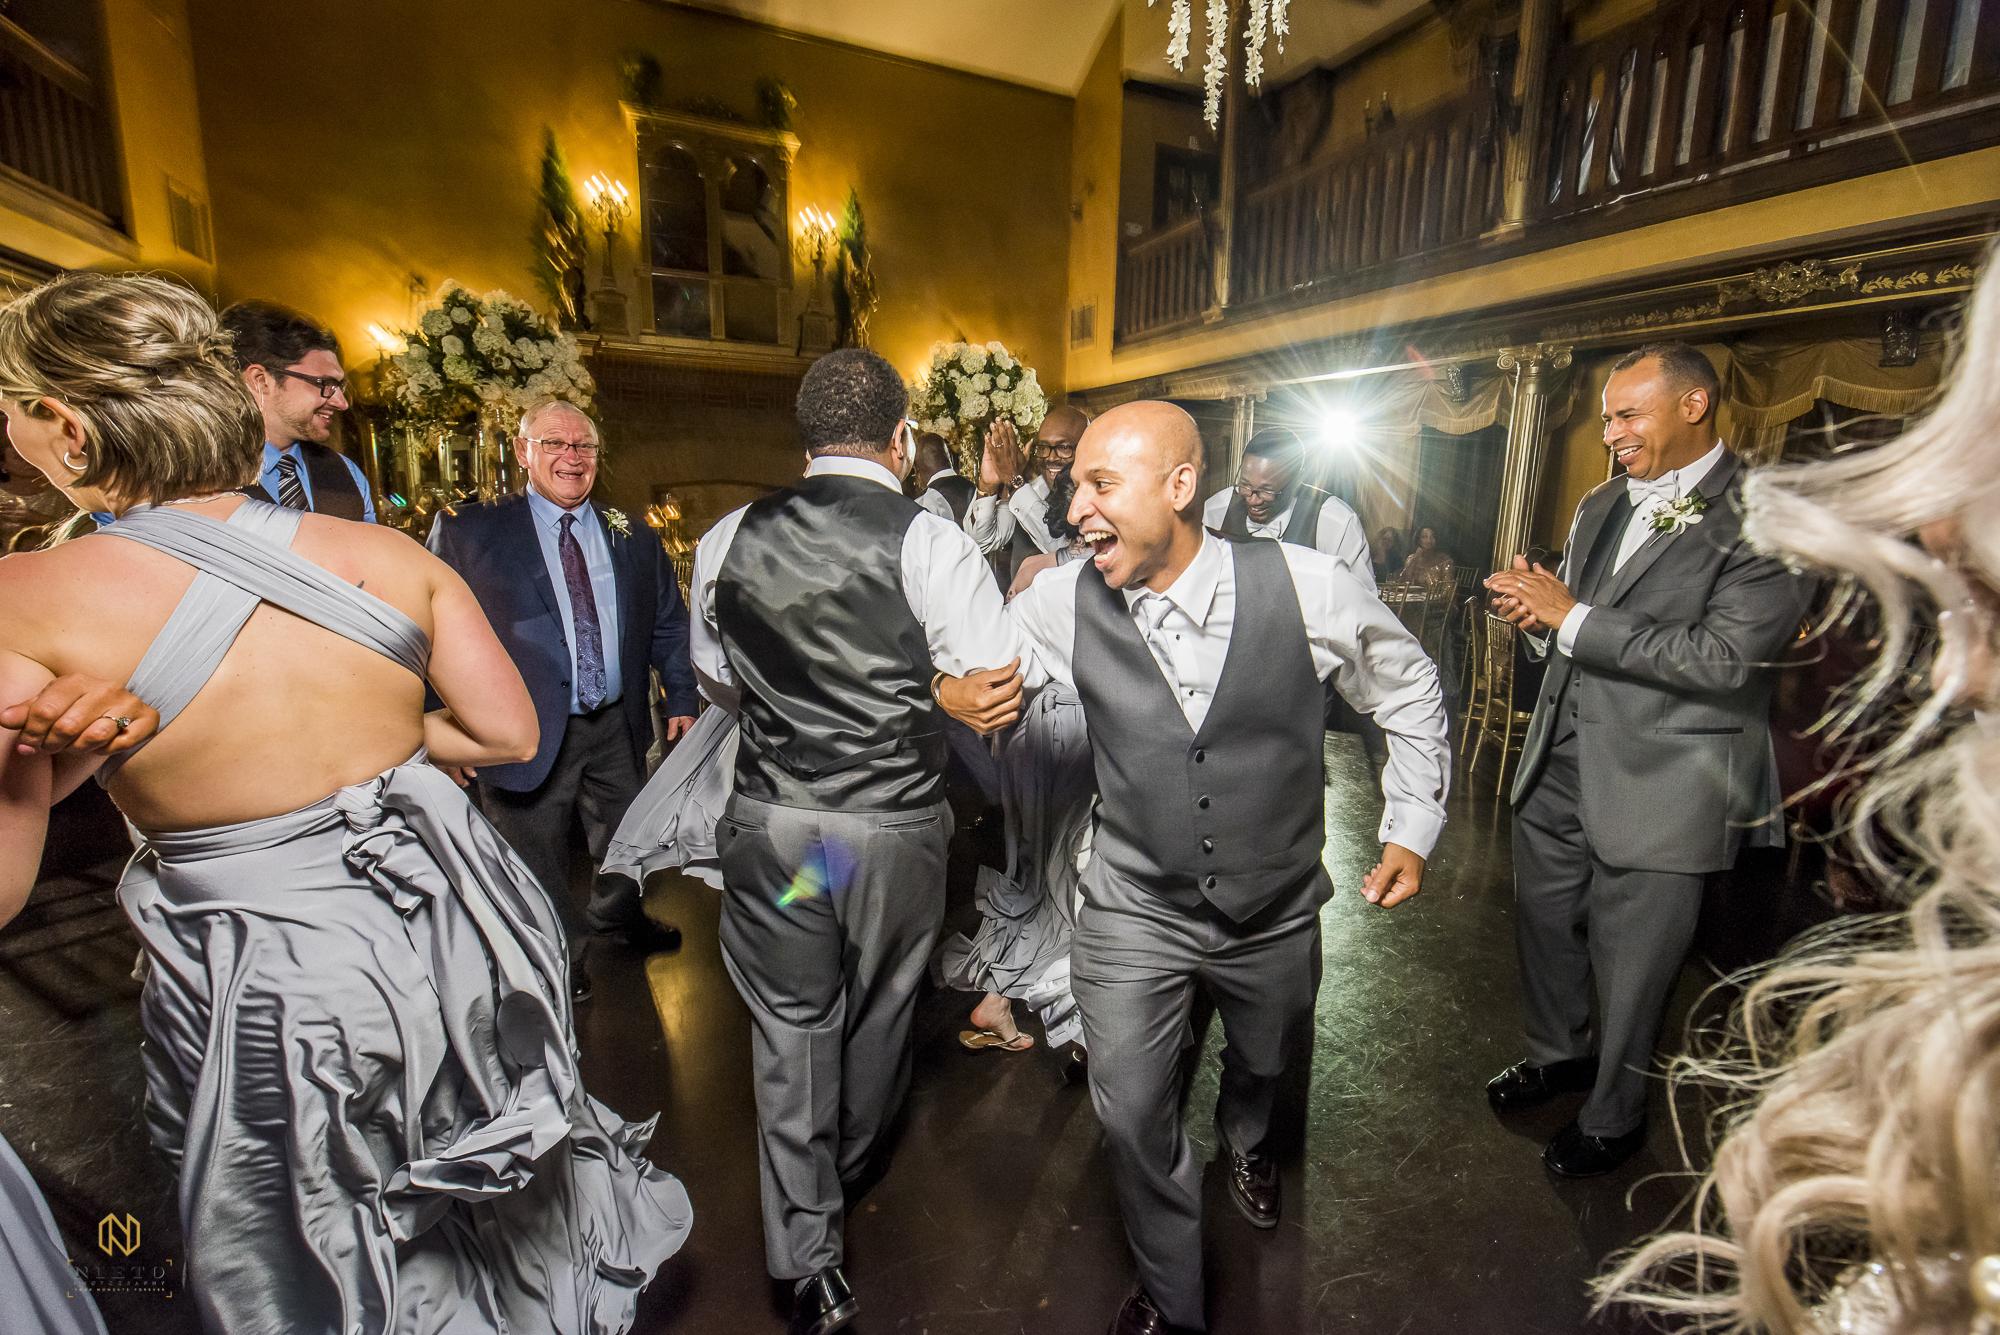 Barclay Villa Wedding - Tegran & Suzanne - 00655 Higgs - Fraites Nieto Photography.jpg